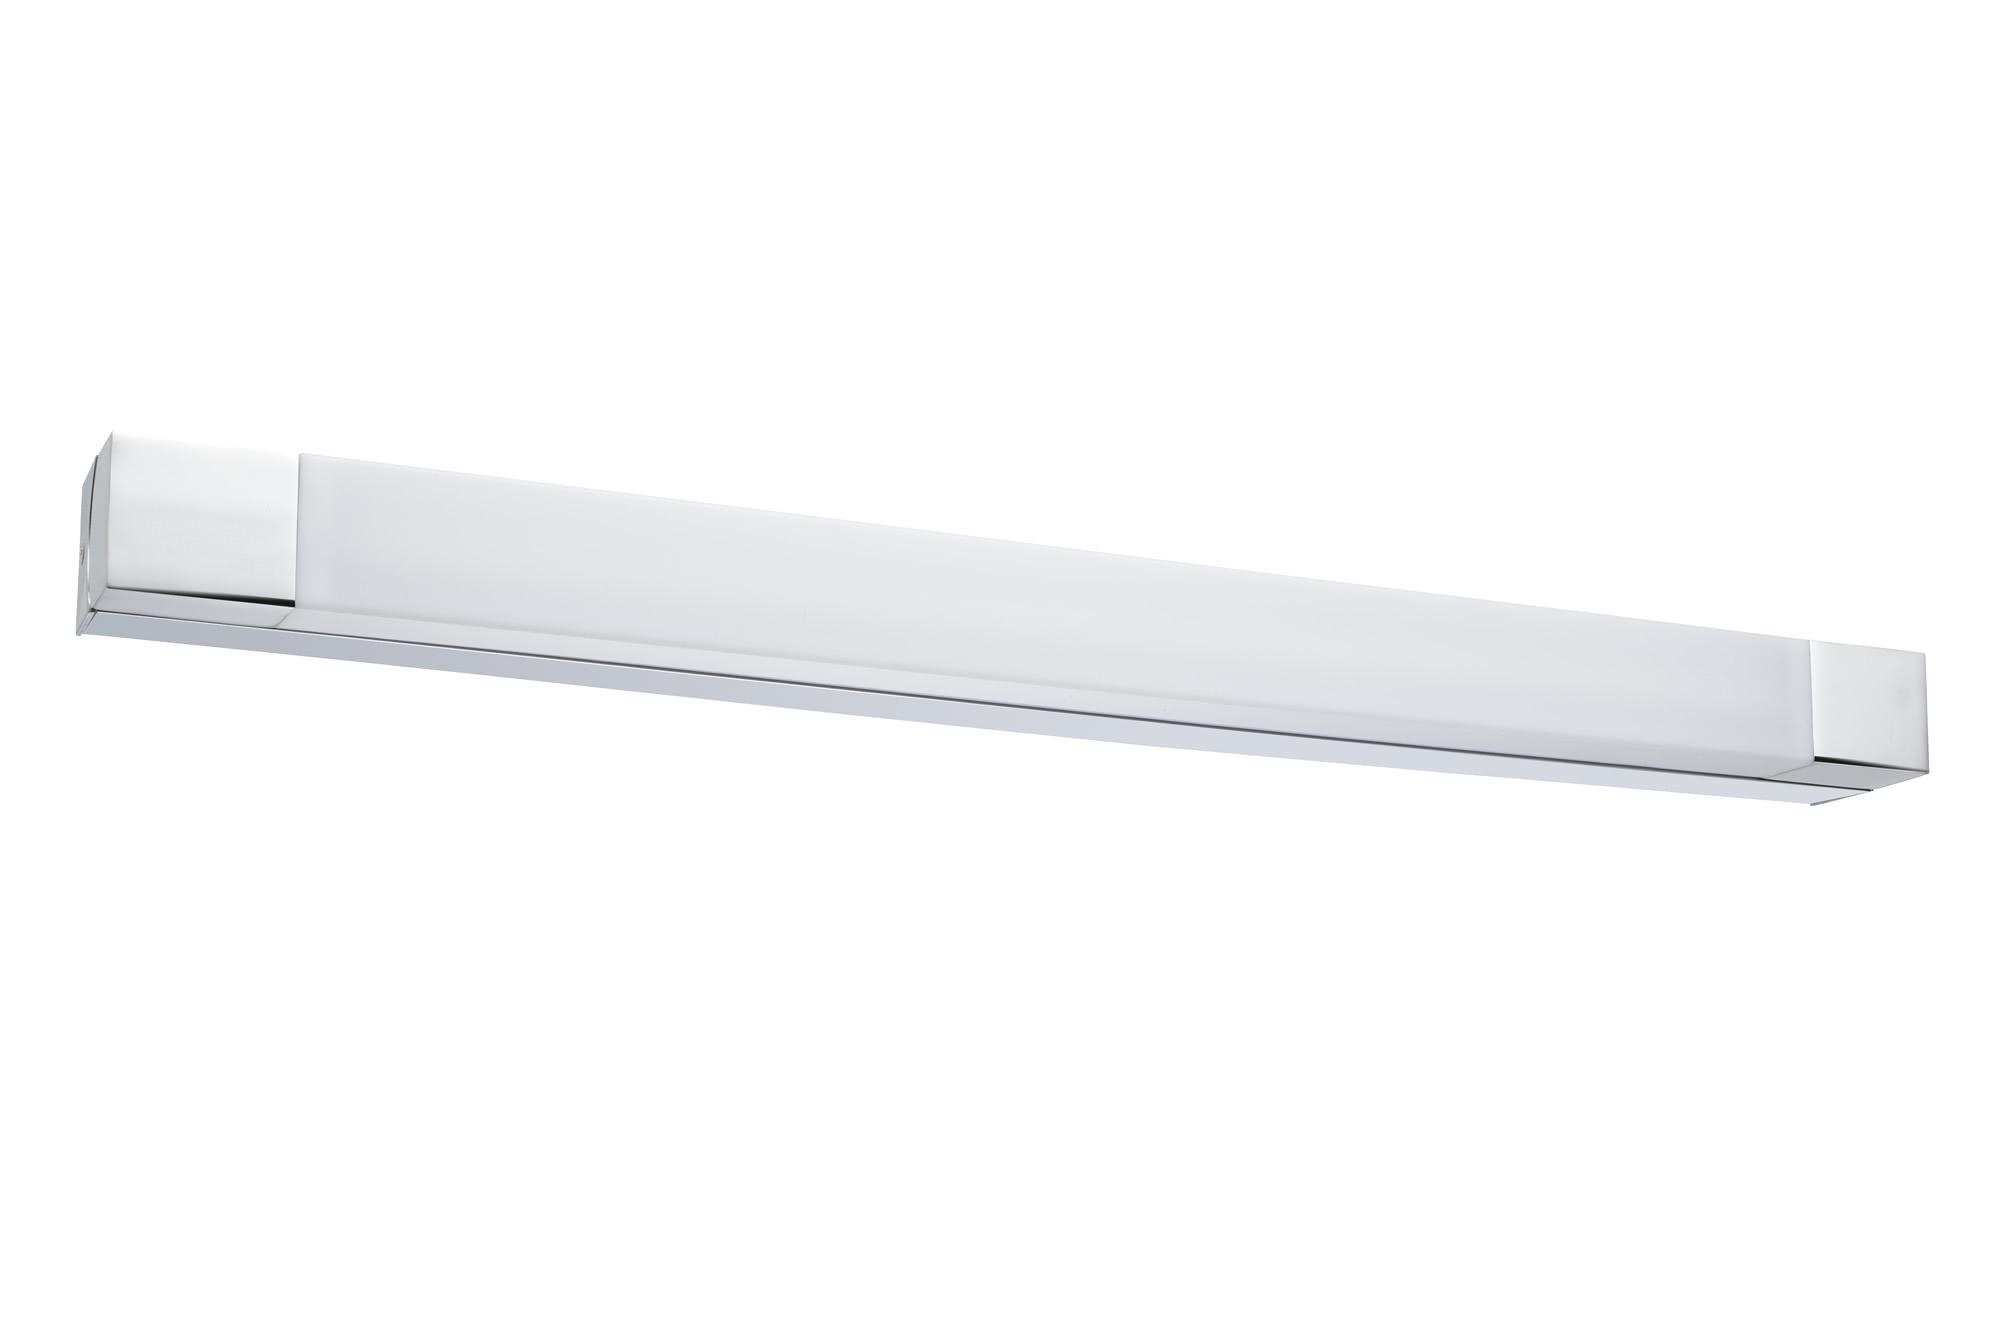 Paulmann. 70365 Светильник настенный 1x14W Quasar 230V G5 / T5 Хром/Белый